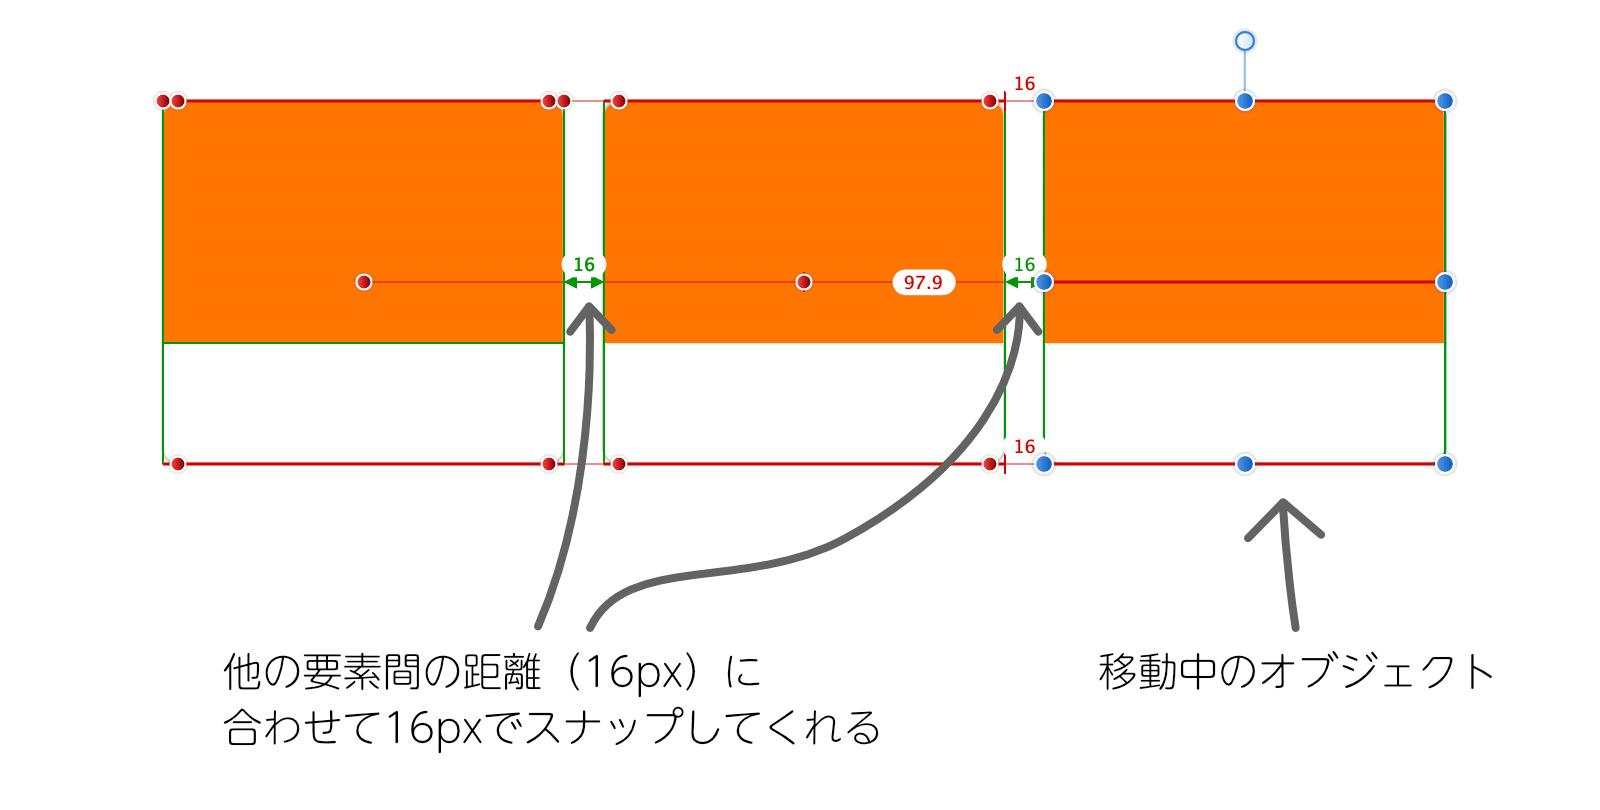 Affinity Designerの動的ガイドでオブジェクト間のギャップが表示されている画面。他のオブジェクト間のギャップのサイズに合わせた距離で移動中のオブジェクトがスナップしてくれることを表しています